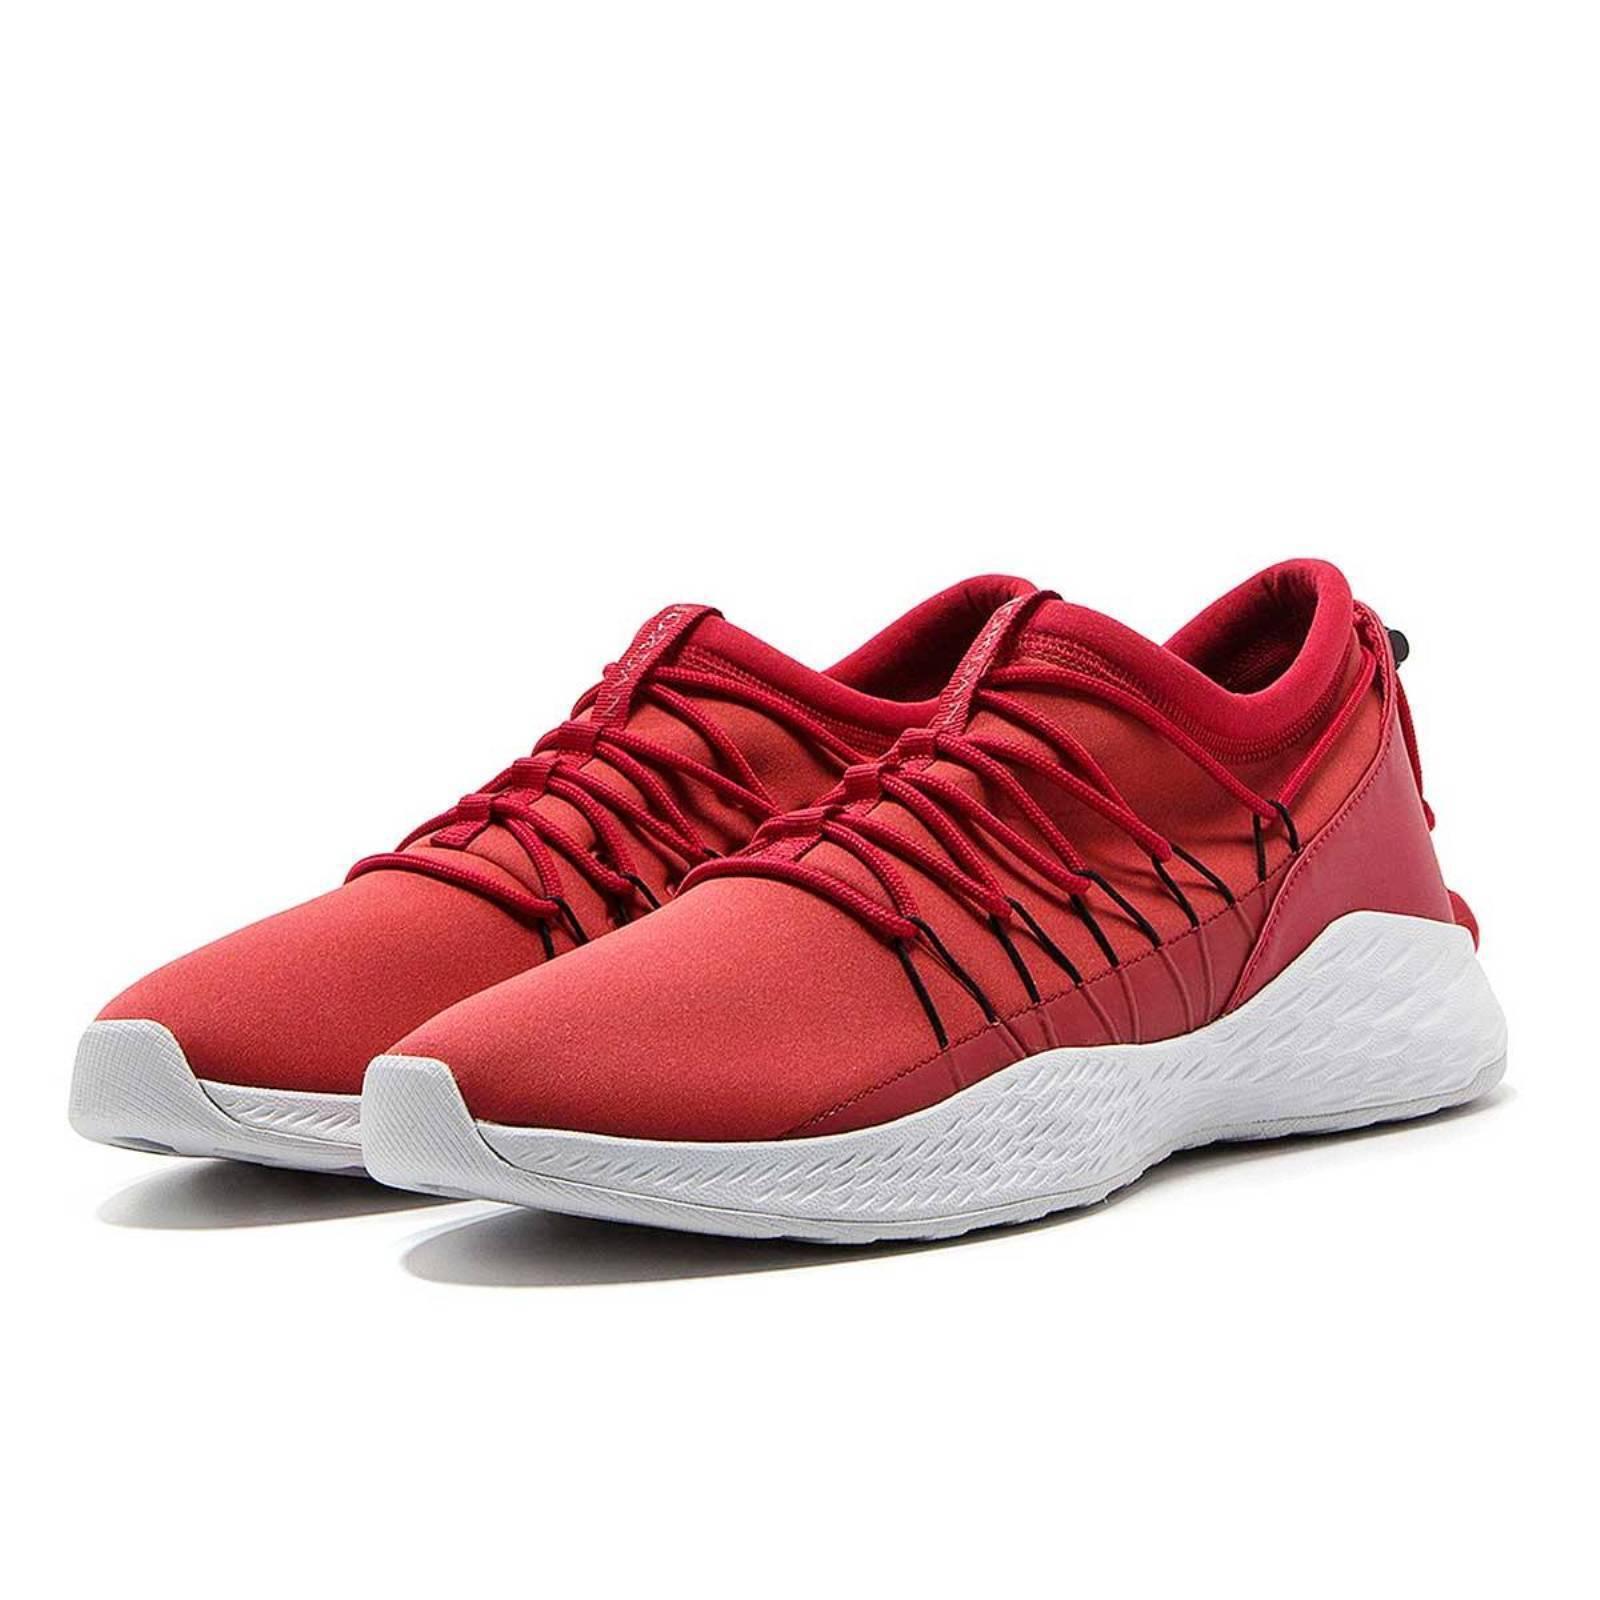 Nike S Basket Air Chaussures Red Formula Jordan 23 Toggle r0aIrw